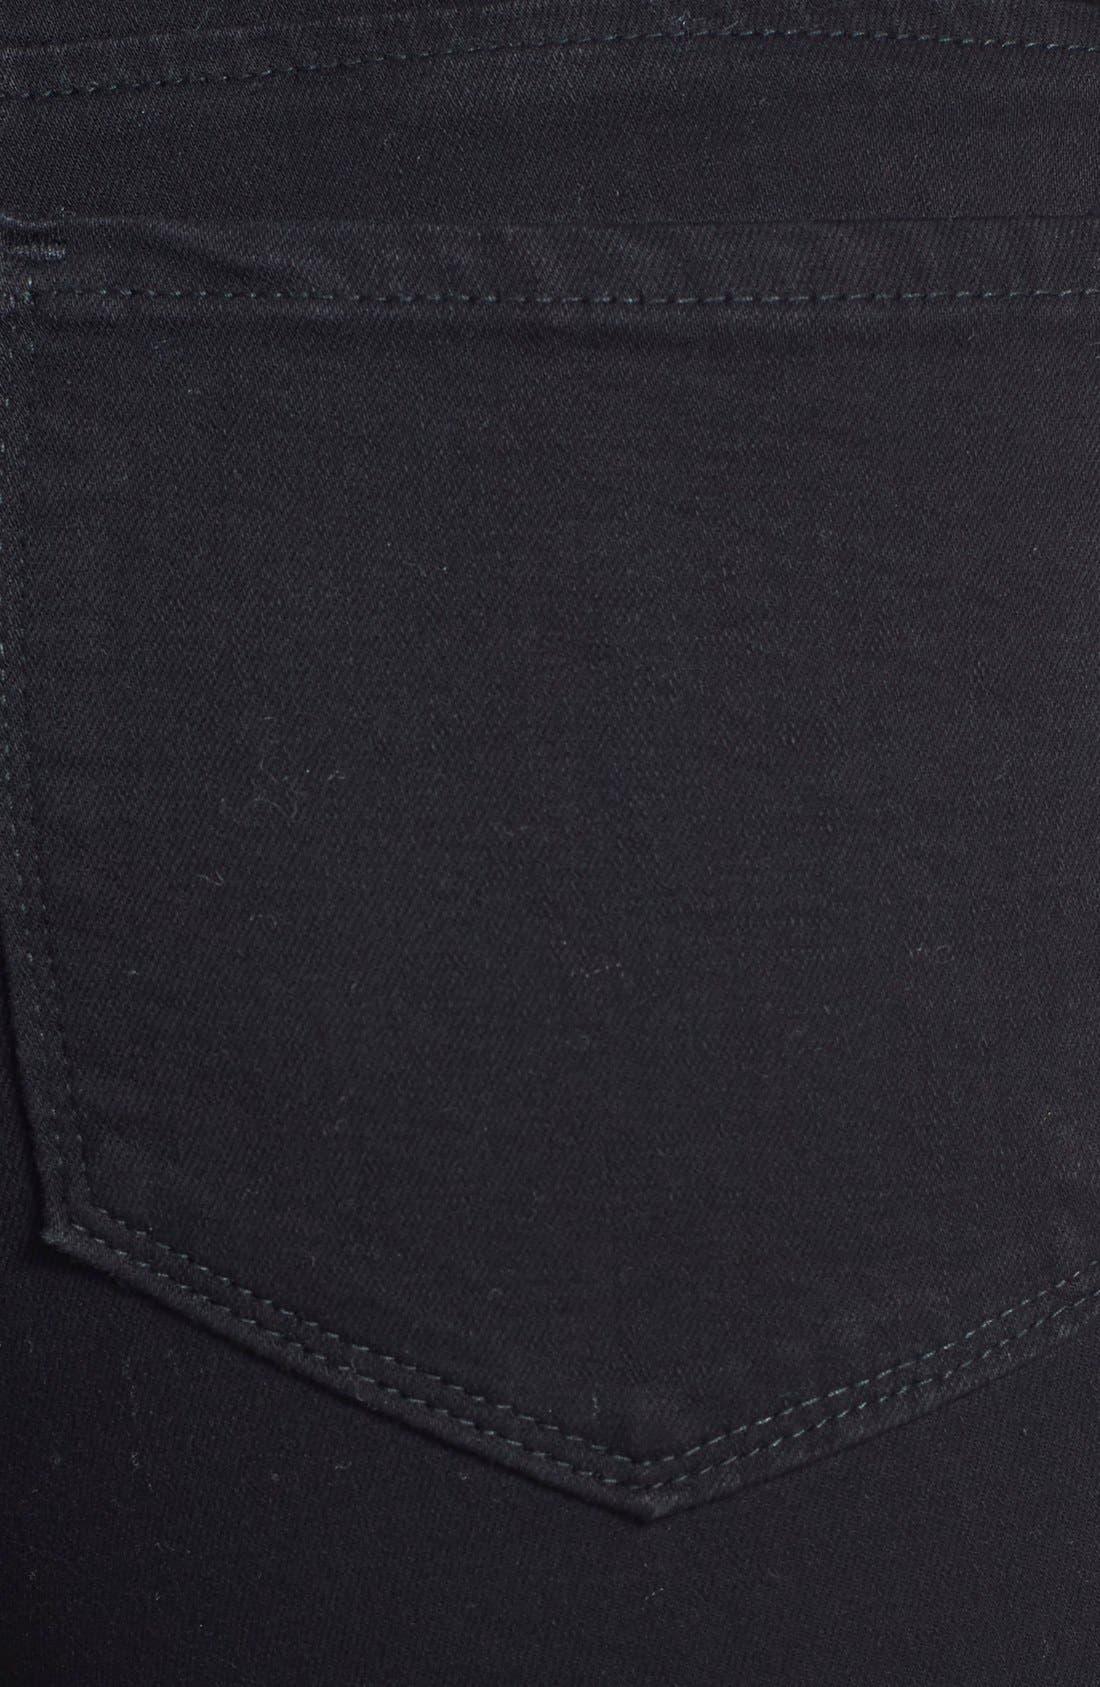 Alina Stretch Ankle Jeans,                             Alternate thumbnail 3, color,                             Black